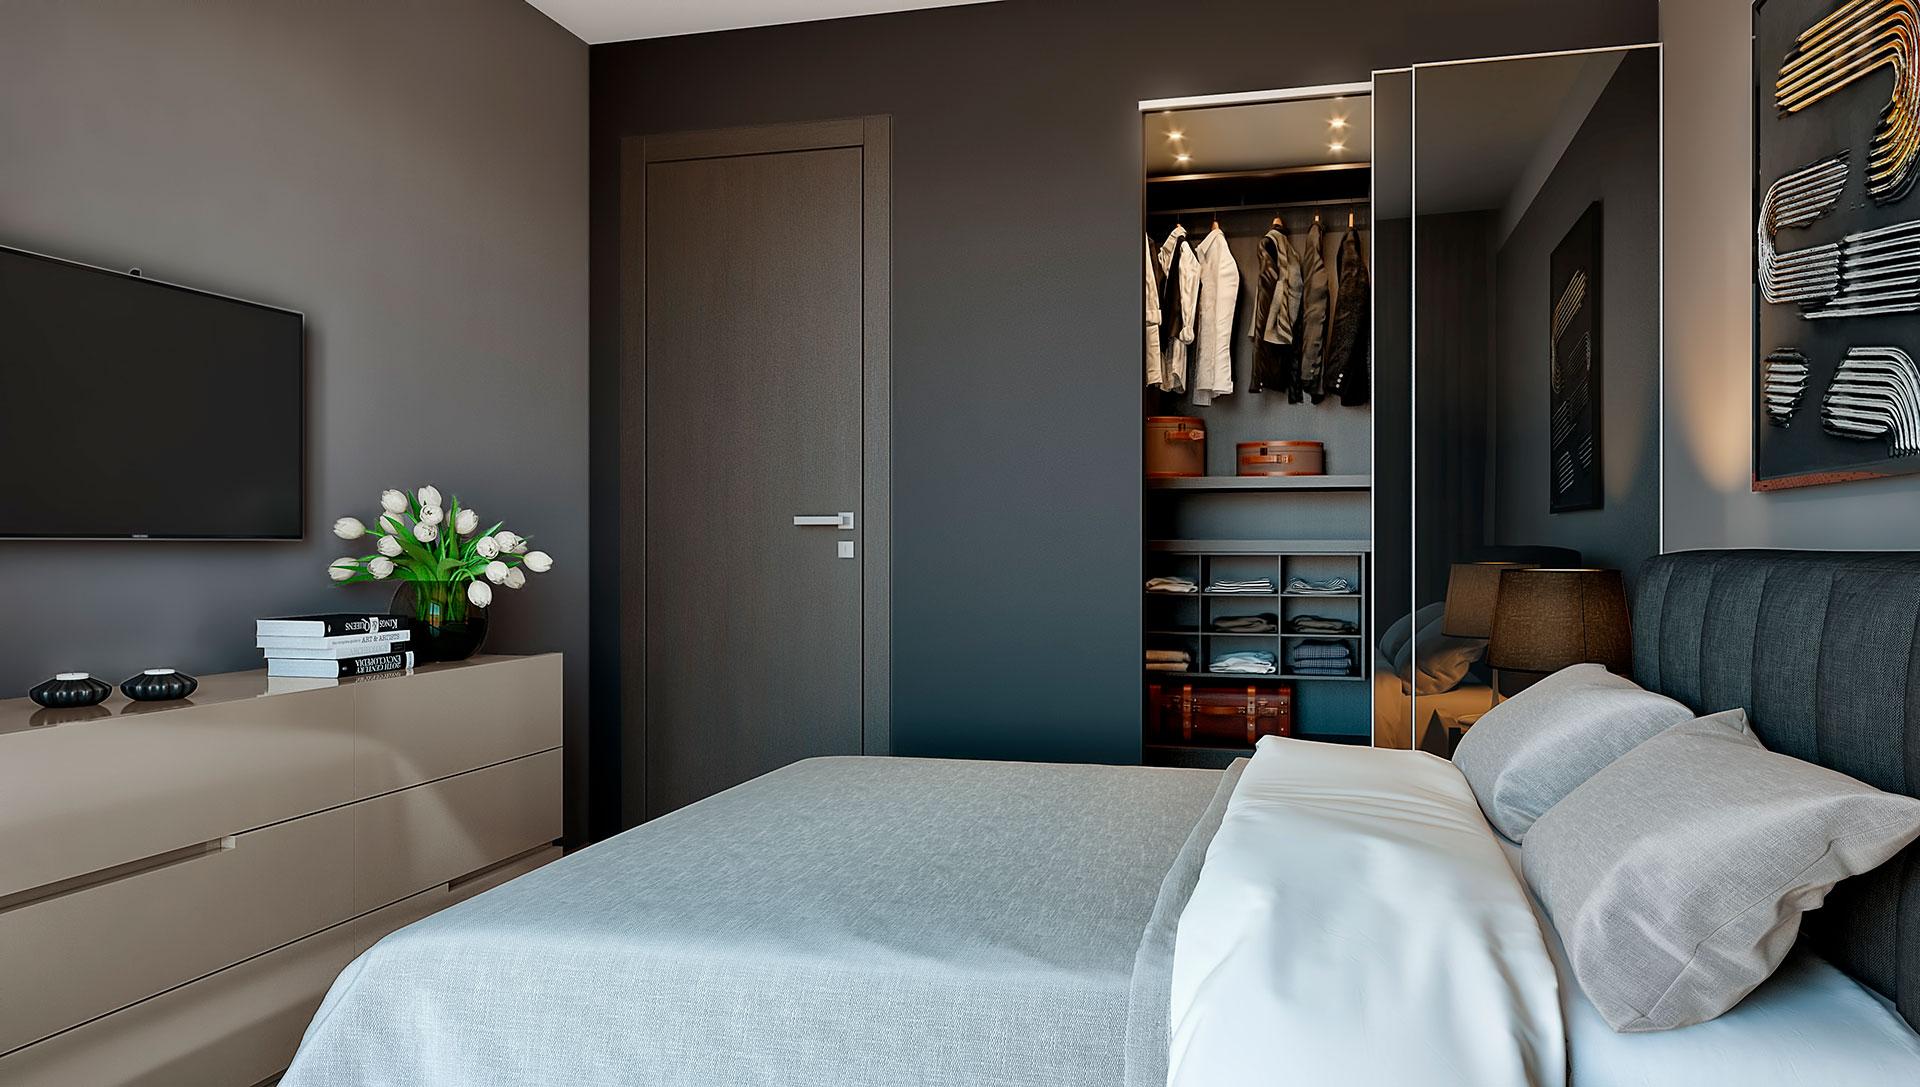 2,5-комнатная квартира в Берлине район Штеглиц (STEGLITZ)